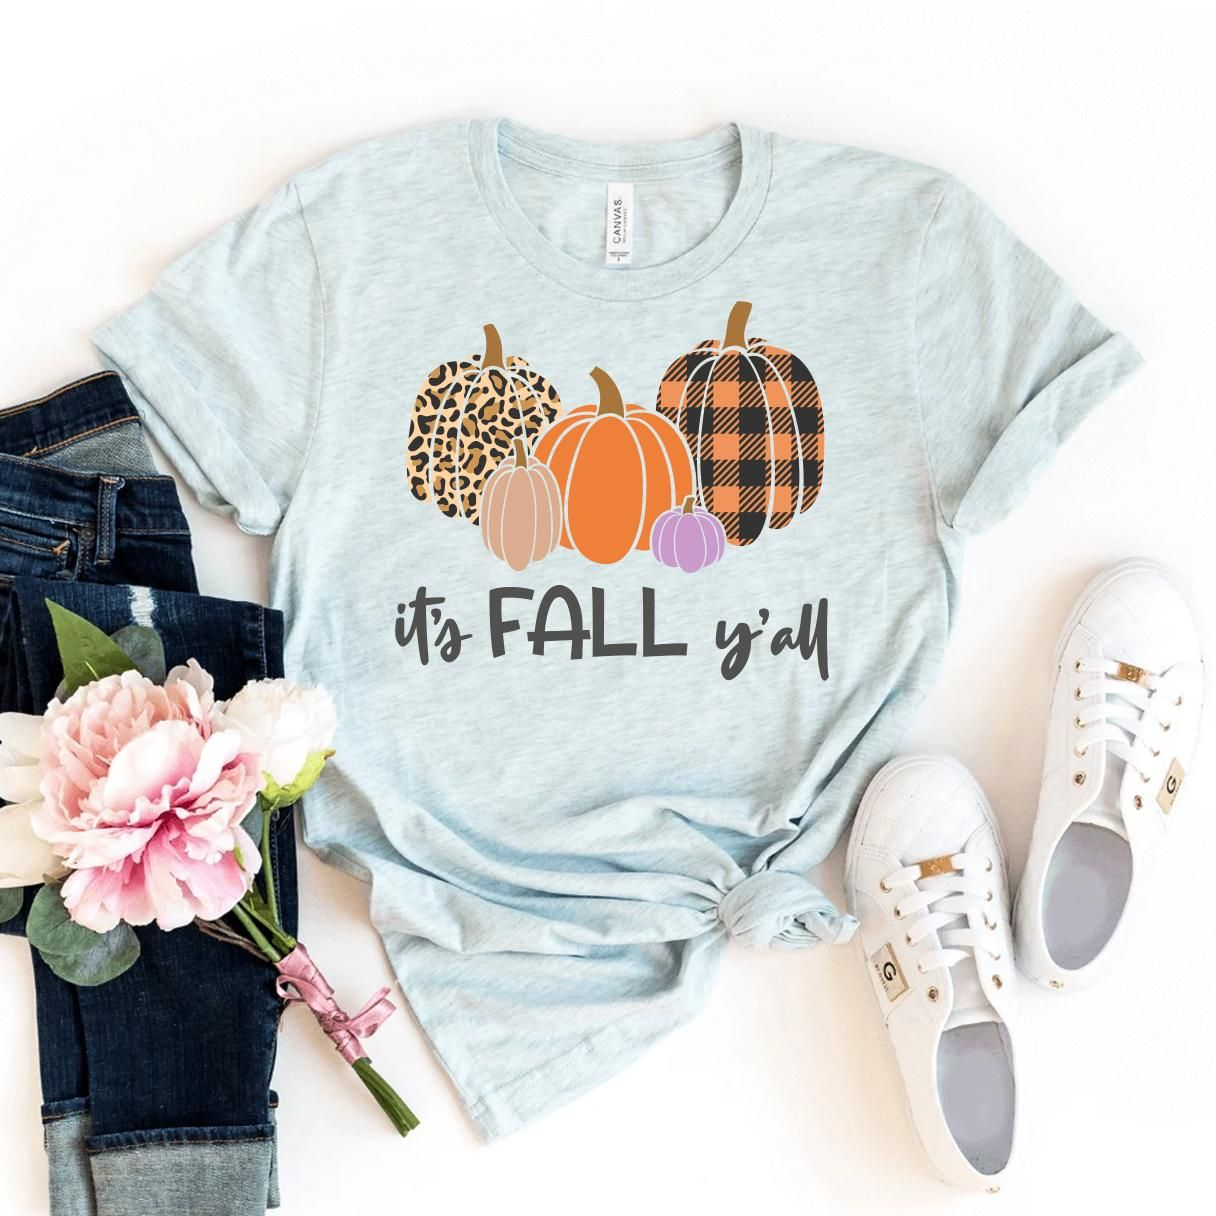 It's Fall Y'all T-shirt, Buffalo Plaid Shirt, Leopard Print Tshirt, Autumn Gift, Pumpkin Patch T-shirt, Blessed Shirts, Size X-Large